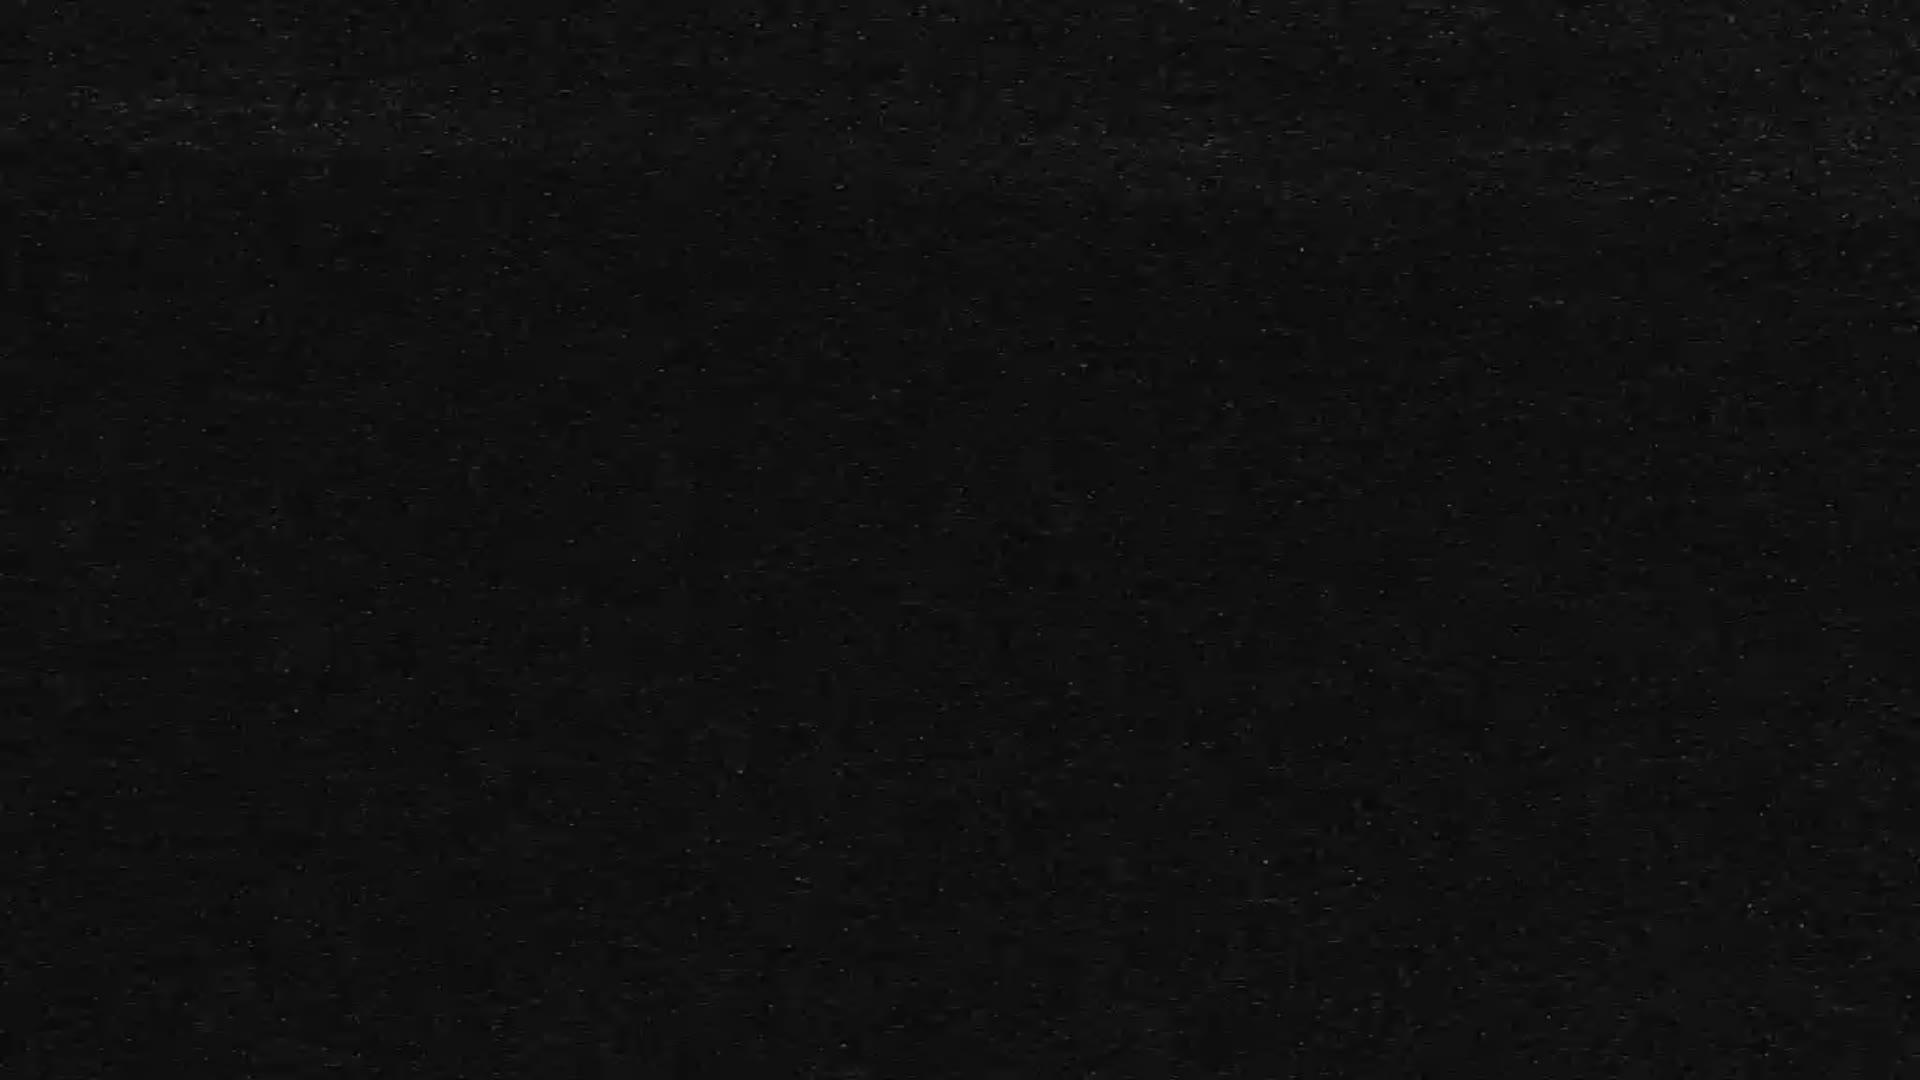 Webcam Skigebiet Szklarska Poreba cam 2 - Riesengebirge